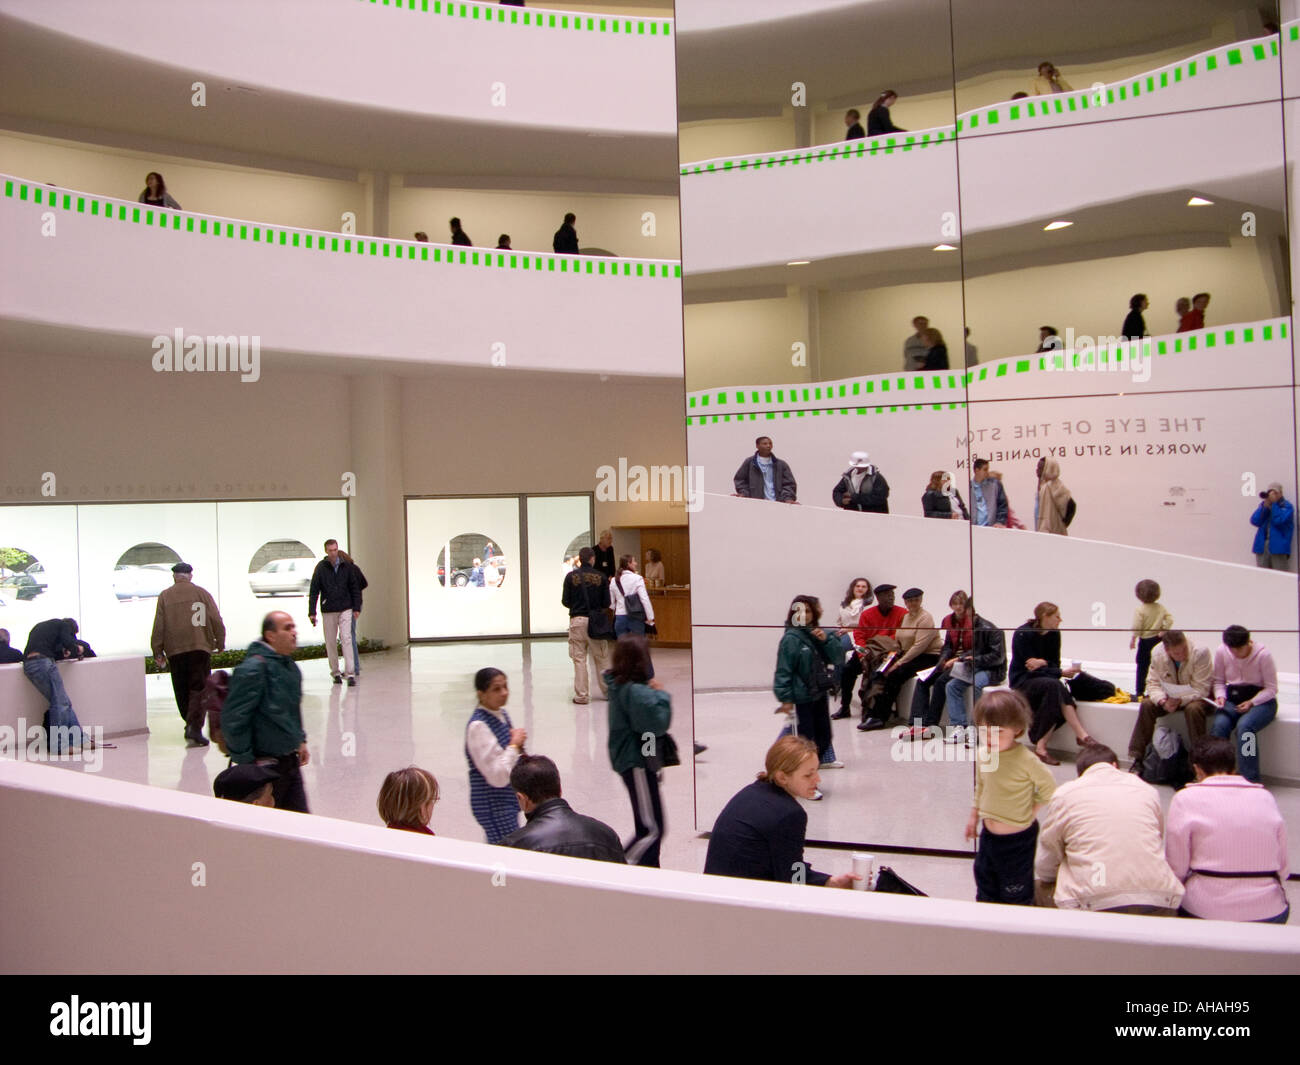 Guggenheim Museum New York Family High Resolution Stock